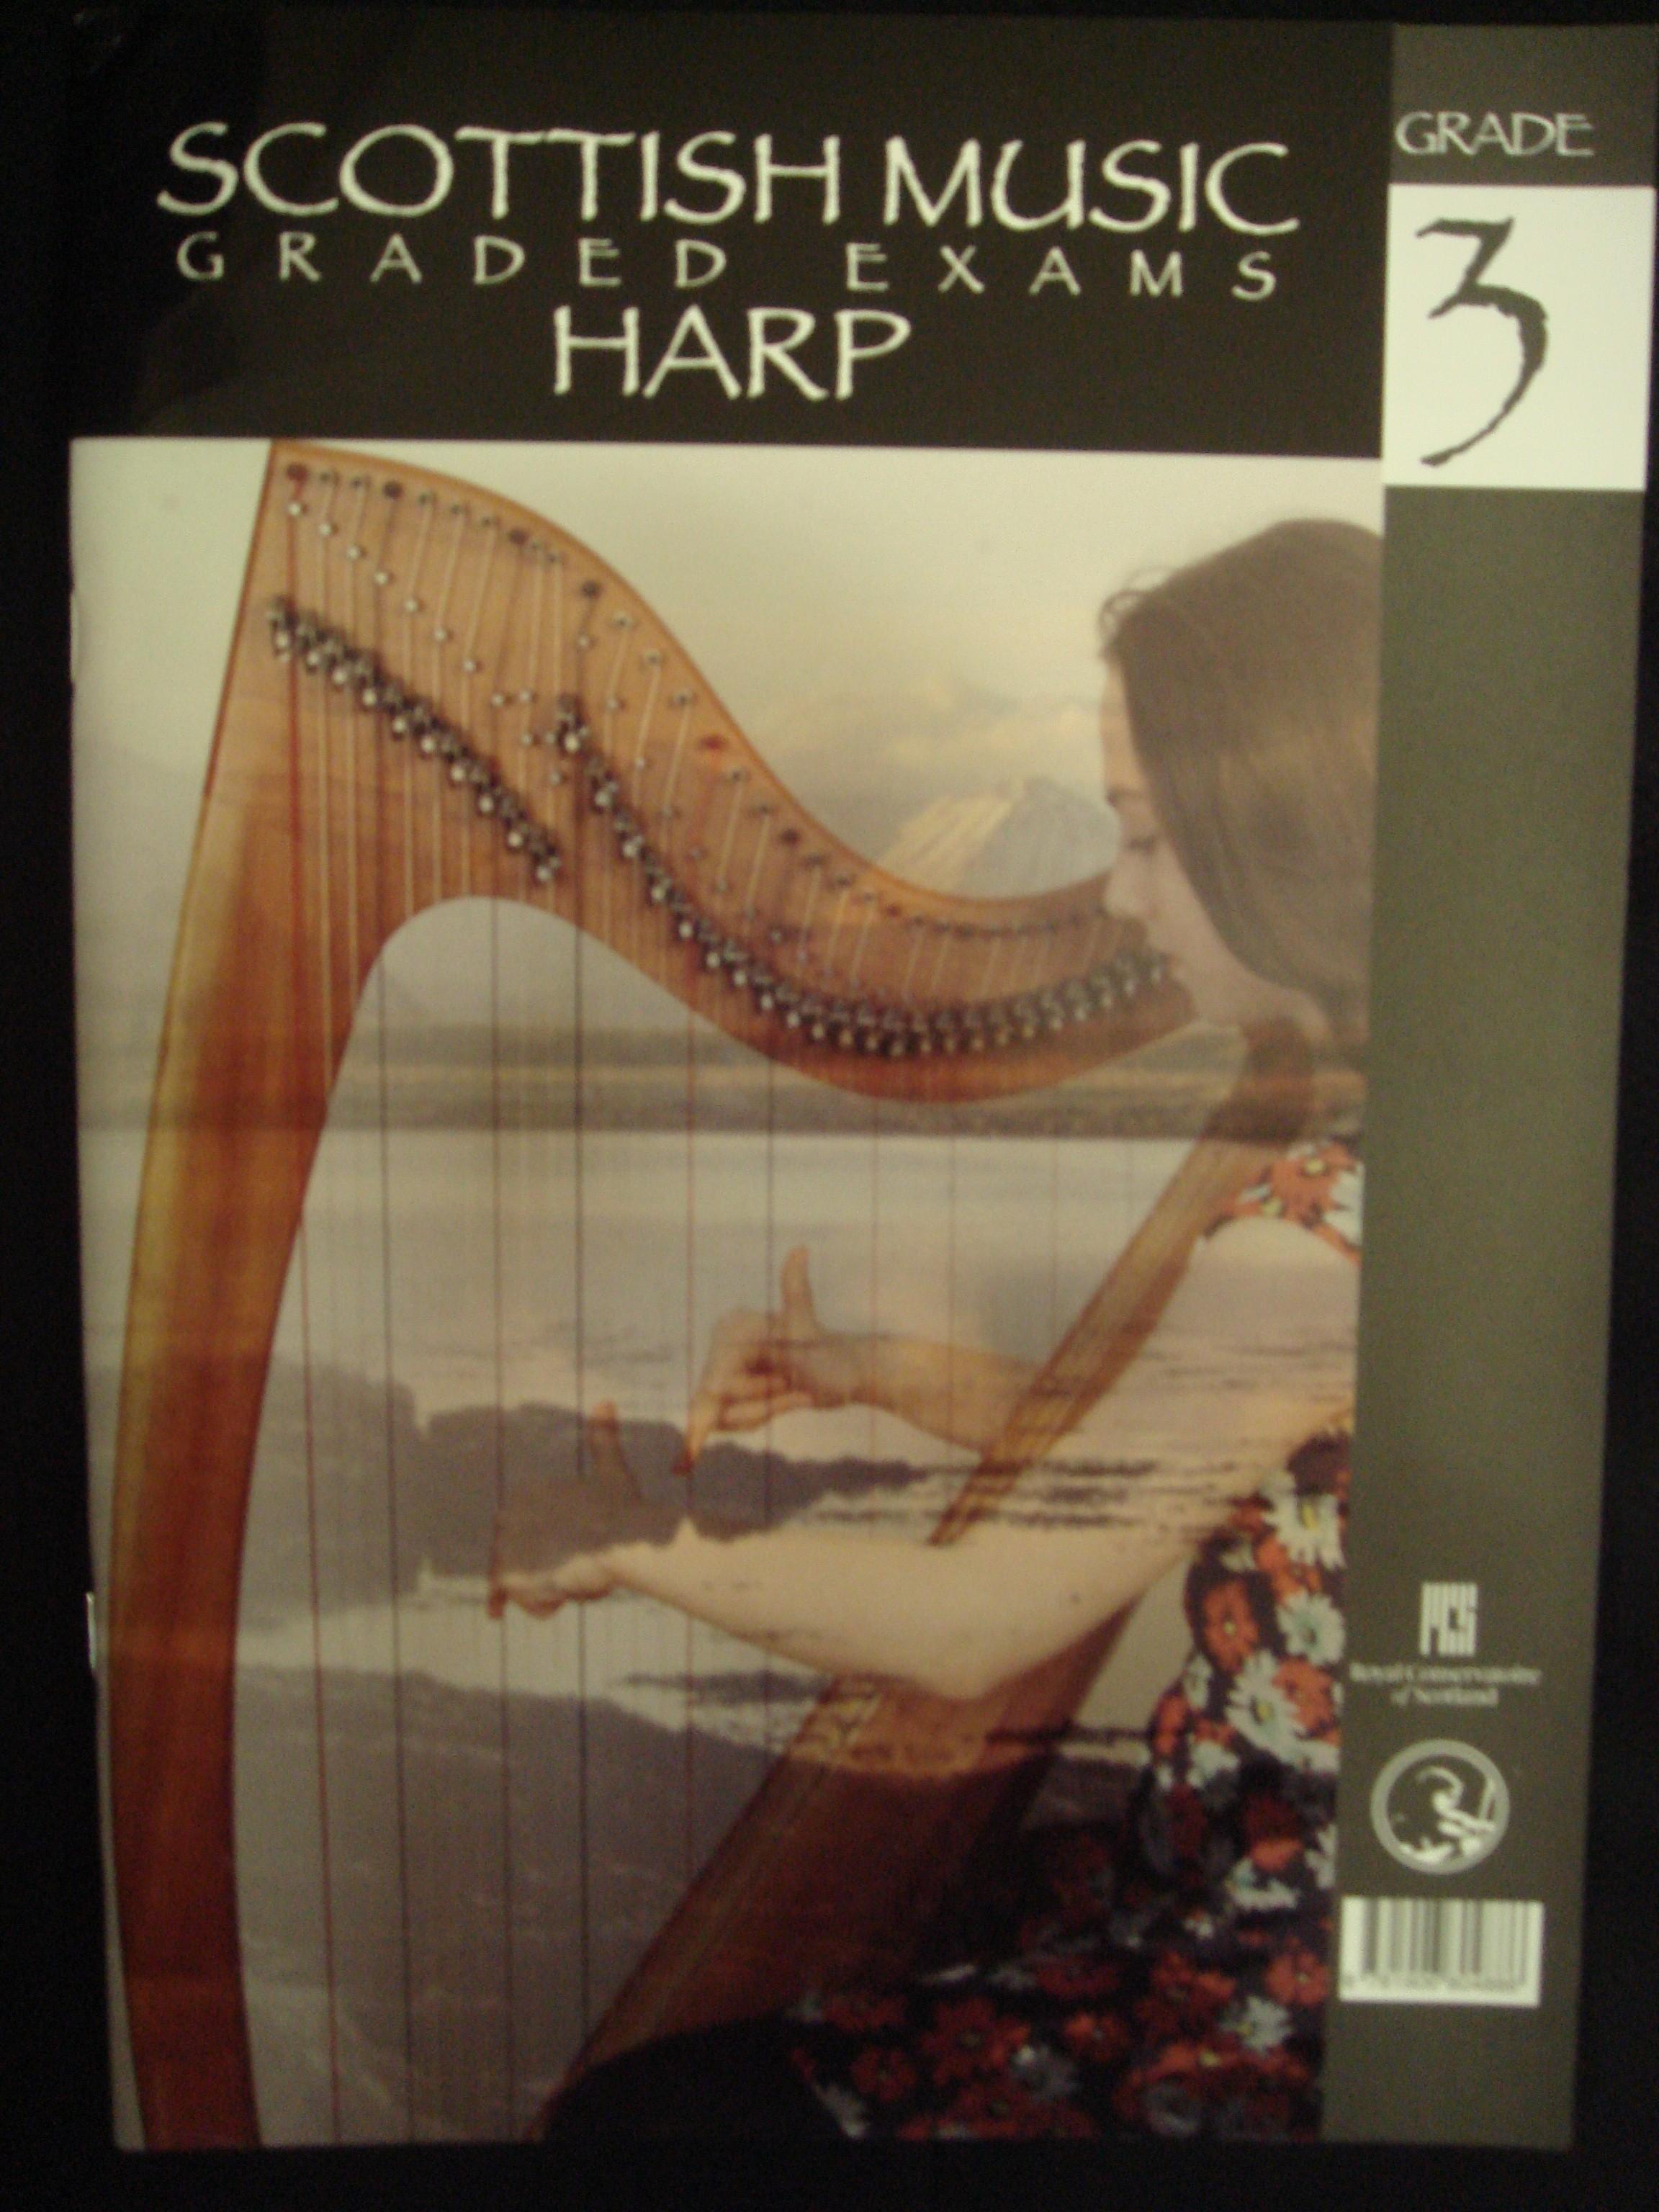 Scottish Music Graded Exams SQA Harp Grade 3 2014-2020 Book S147